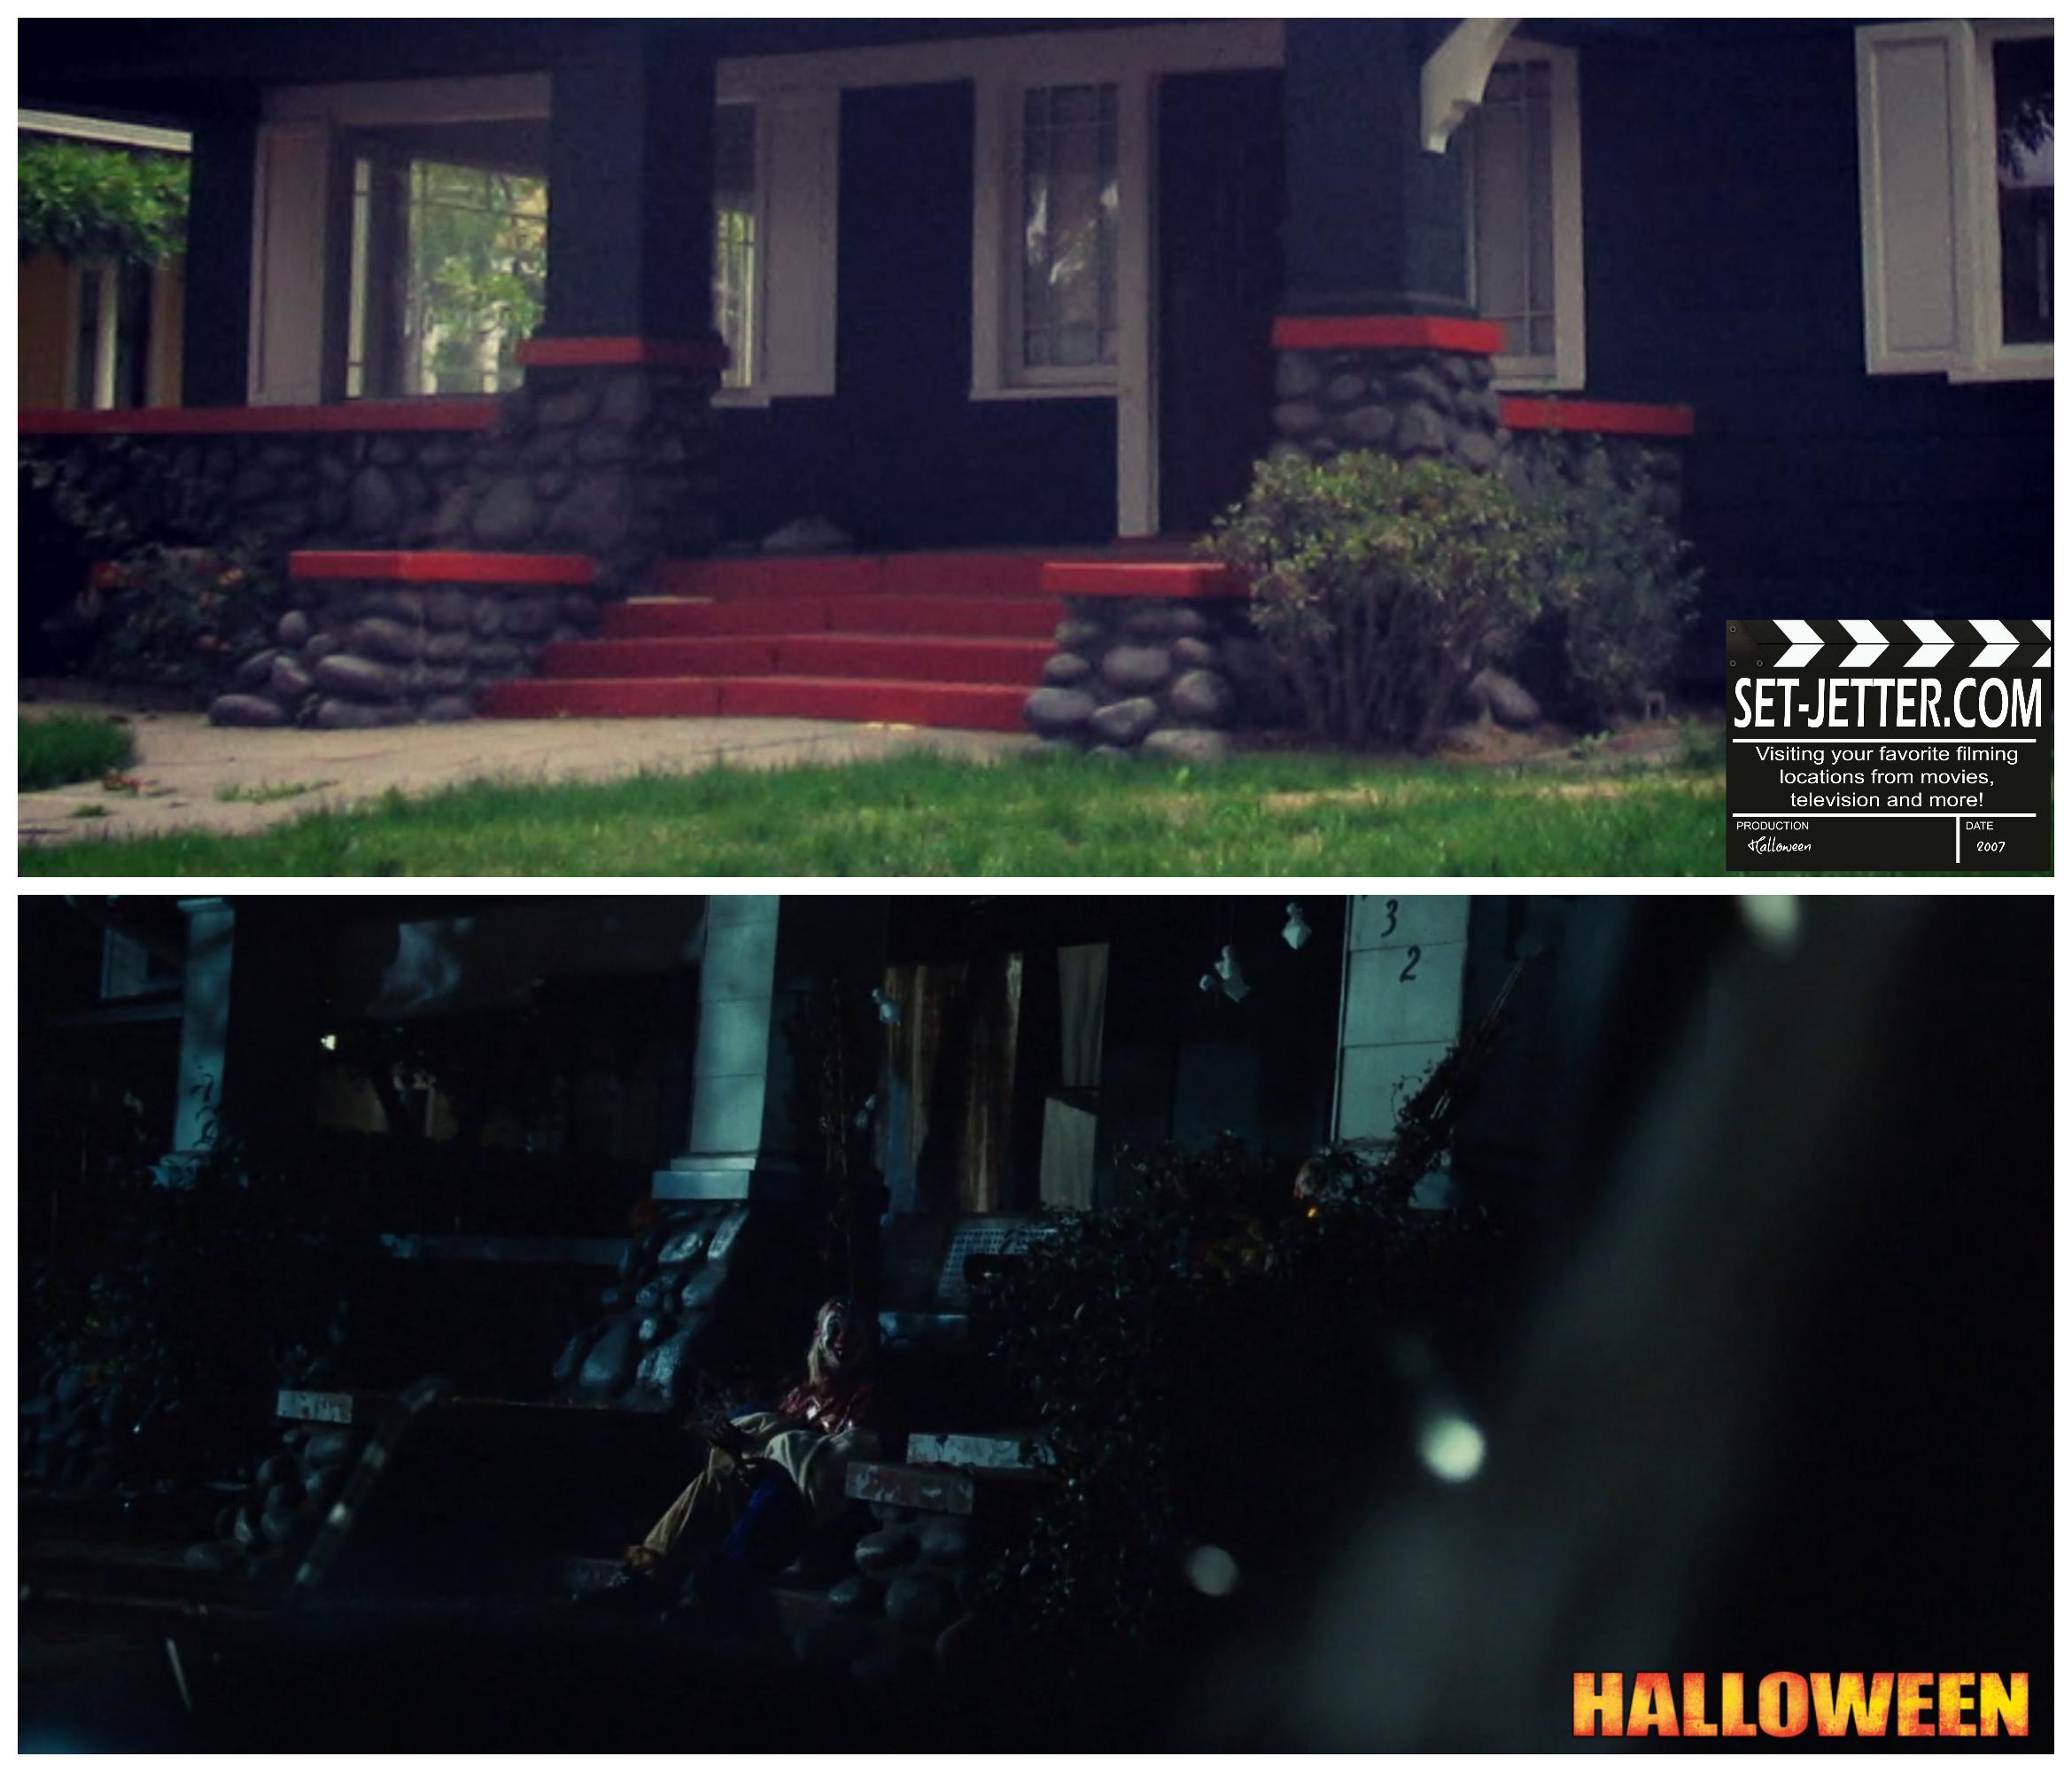 Halloween 2007 comparison 14.jpg